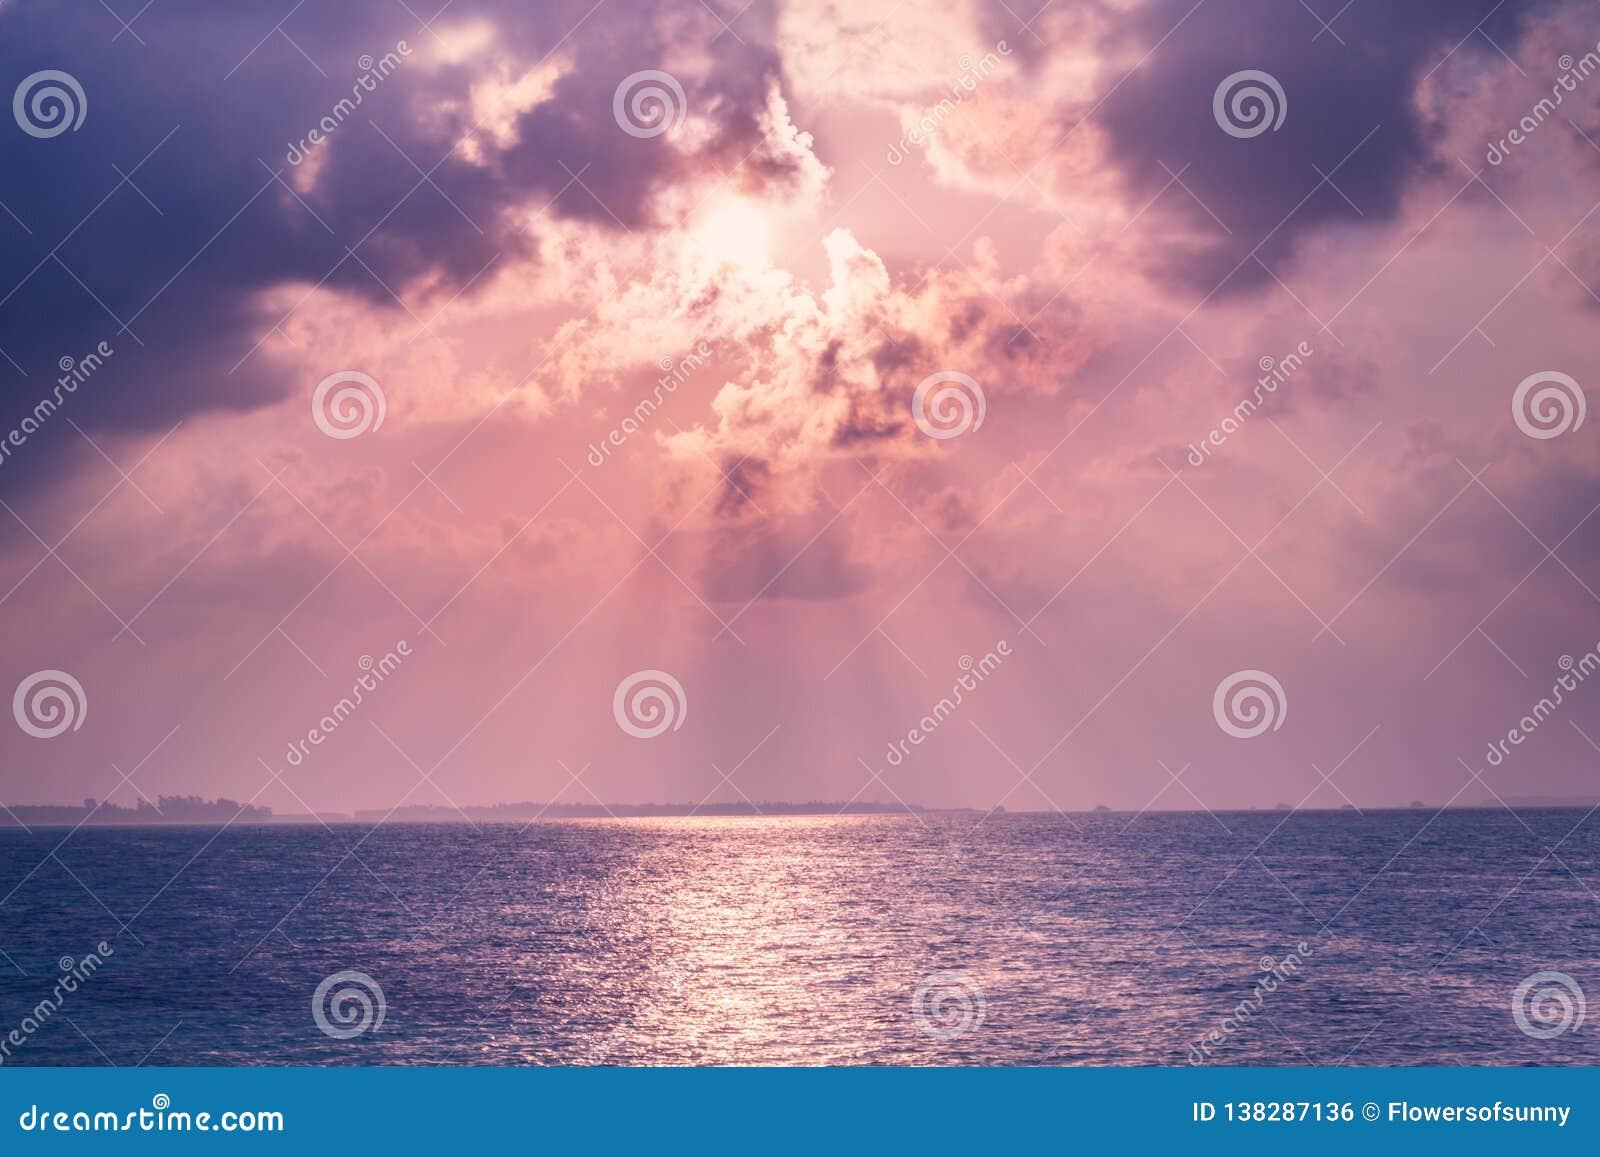 Beautiful Sunset Sunrise Sea And Sky, Sun Rays And Tranquil